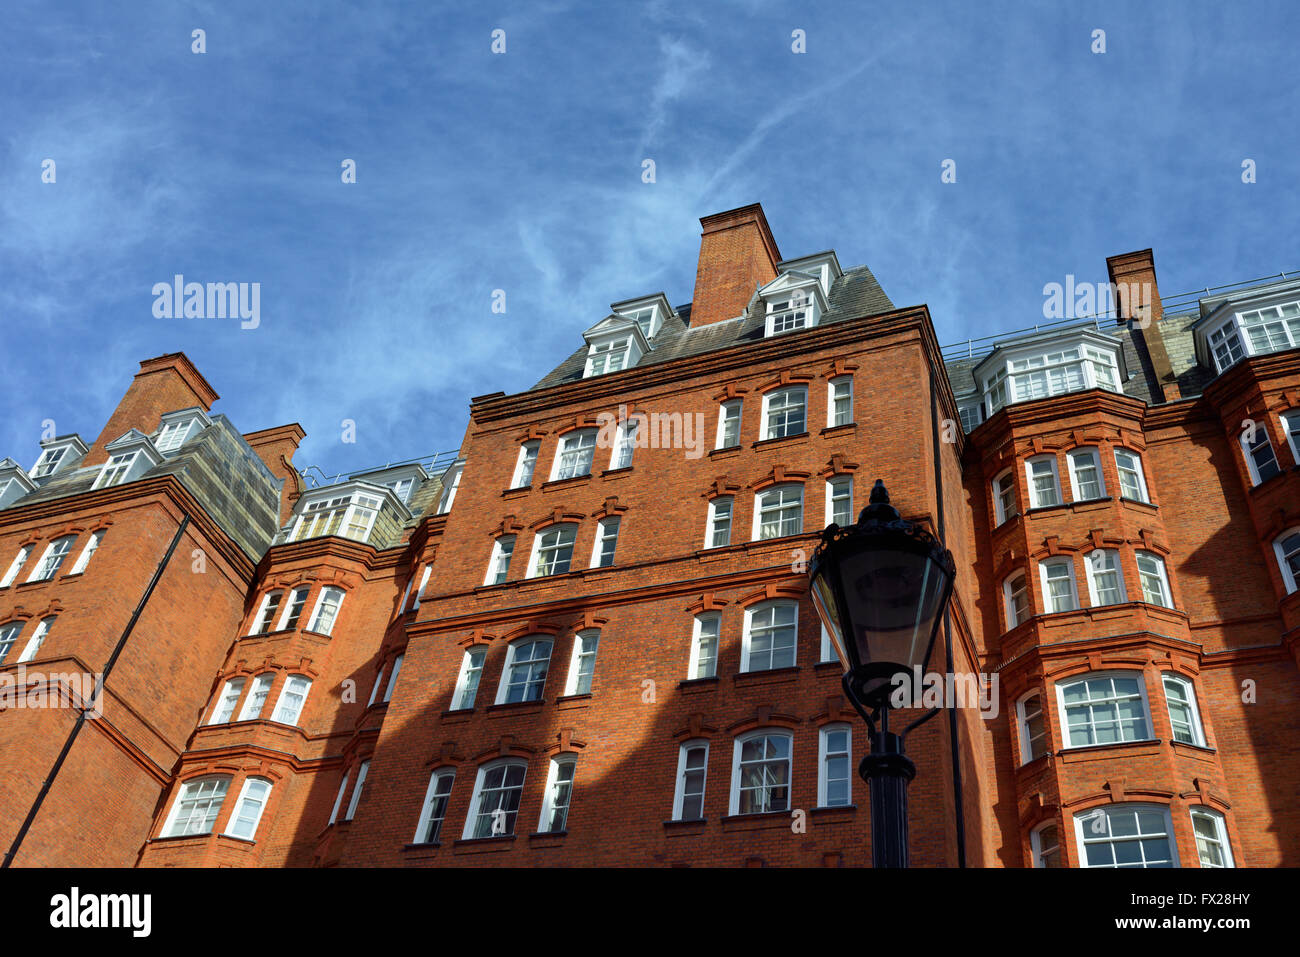 Albert Hall Mansions, Kensington Gore, Kensington and Chelsea, London, United Kingdom Stock Photo